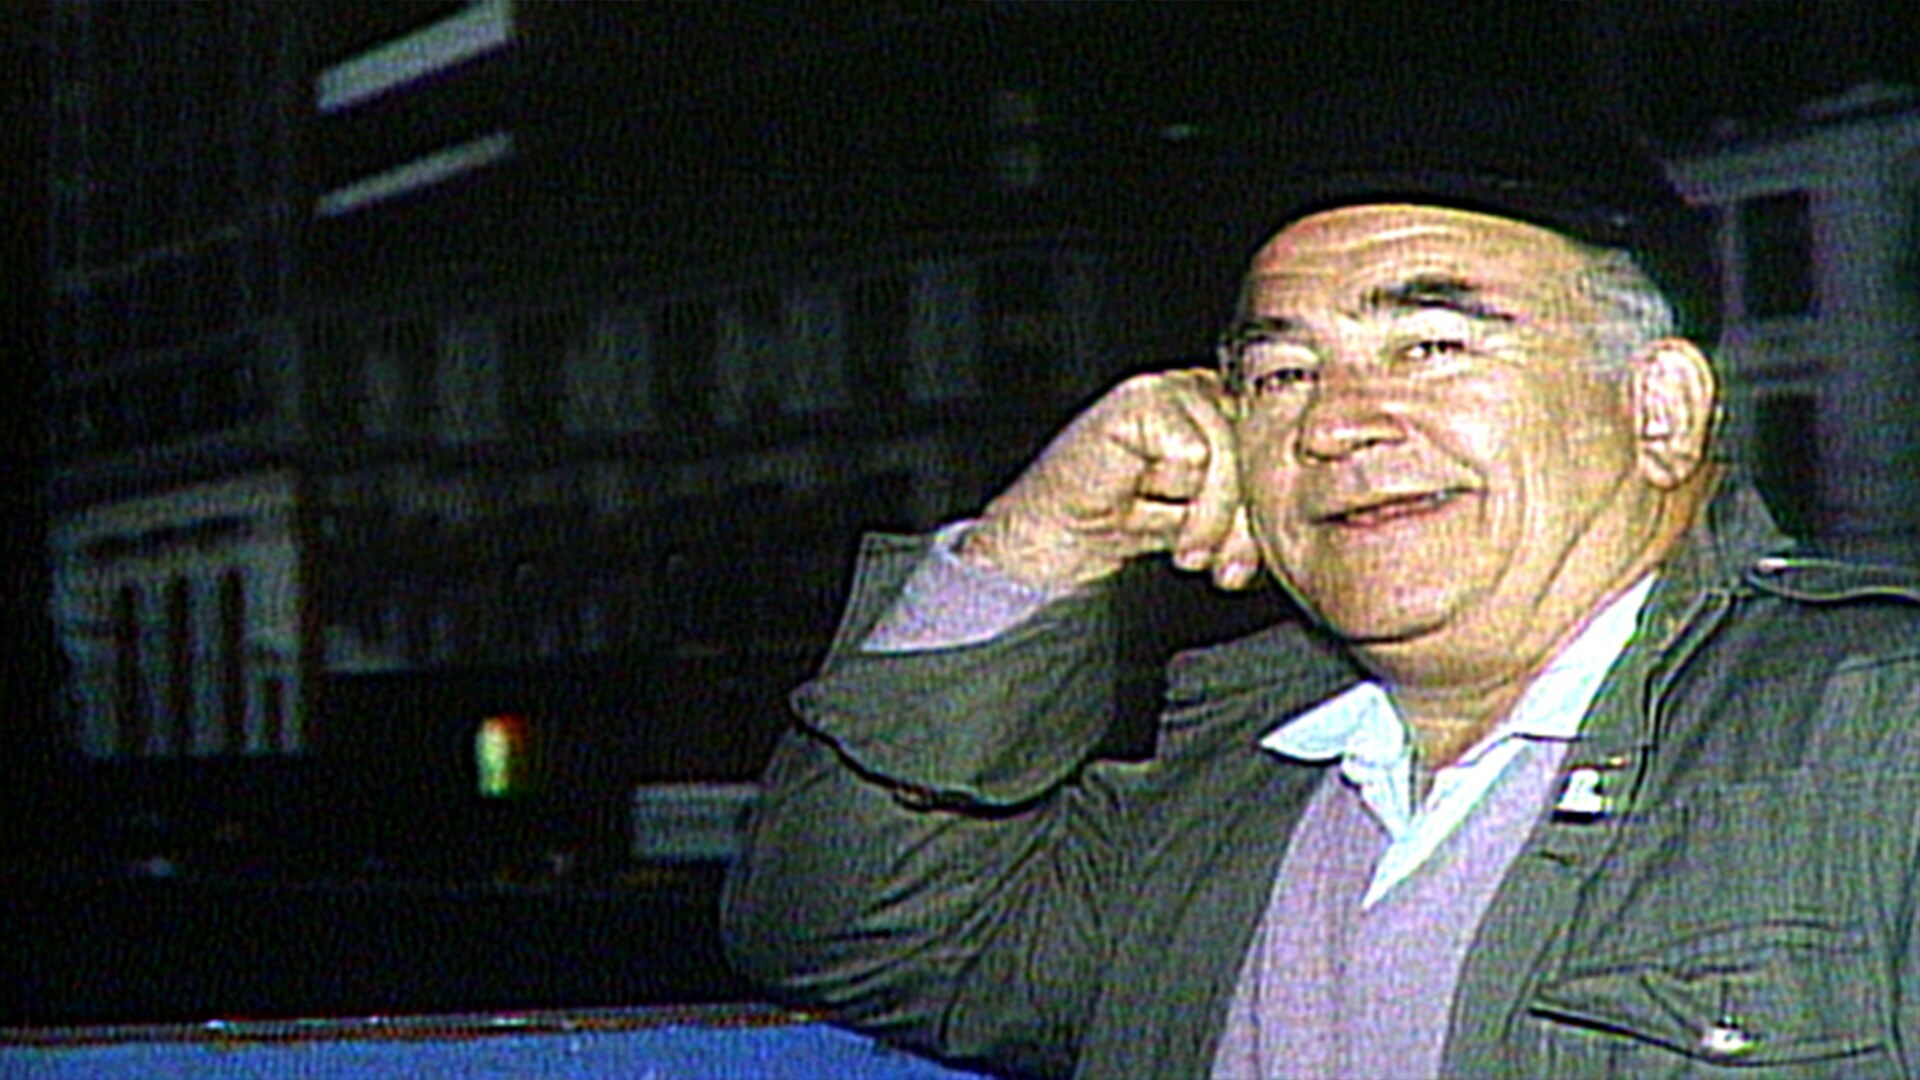 Ed Asner: November 17, 1984